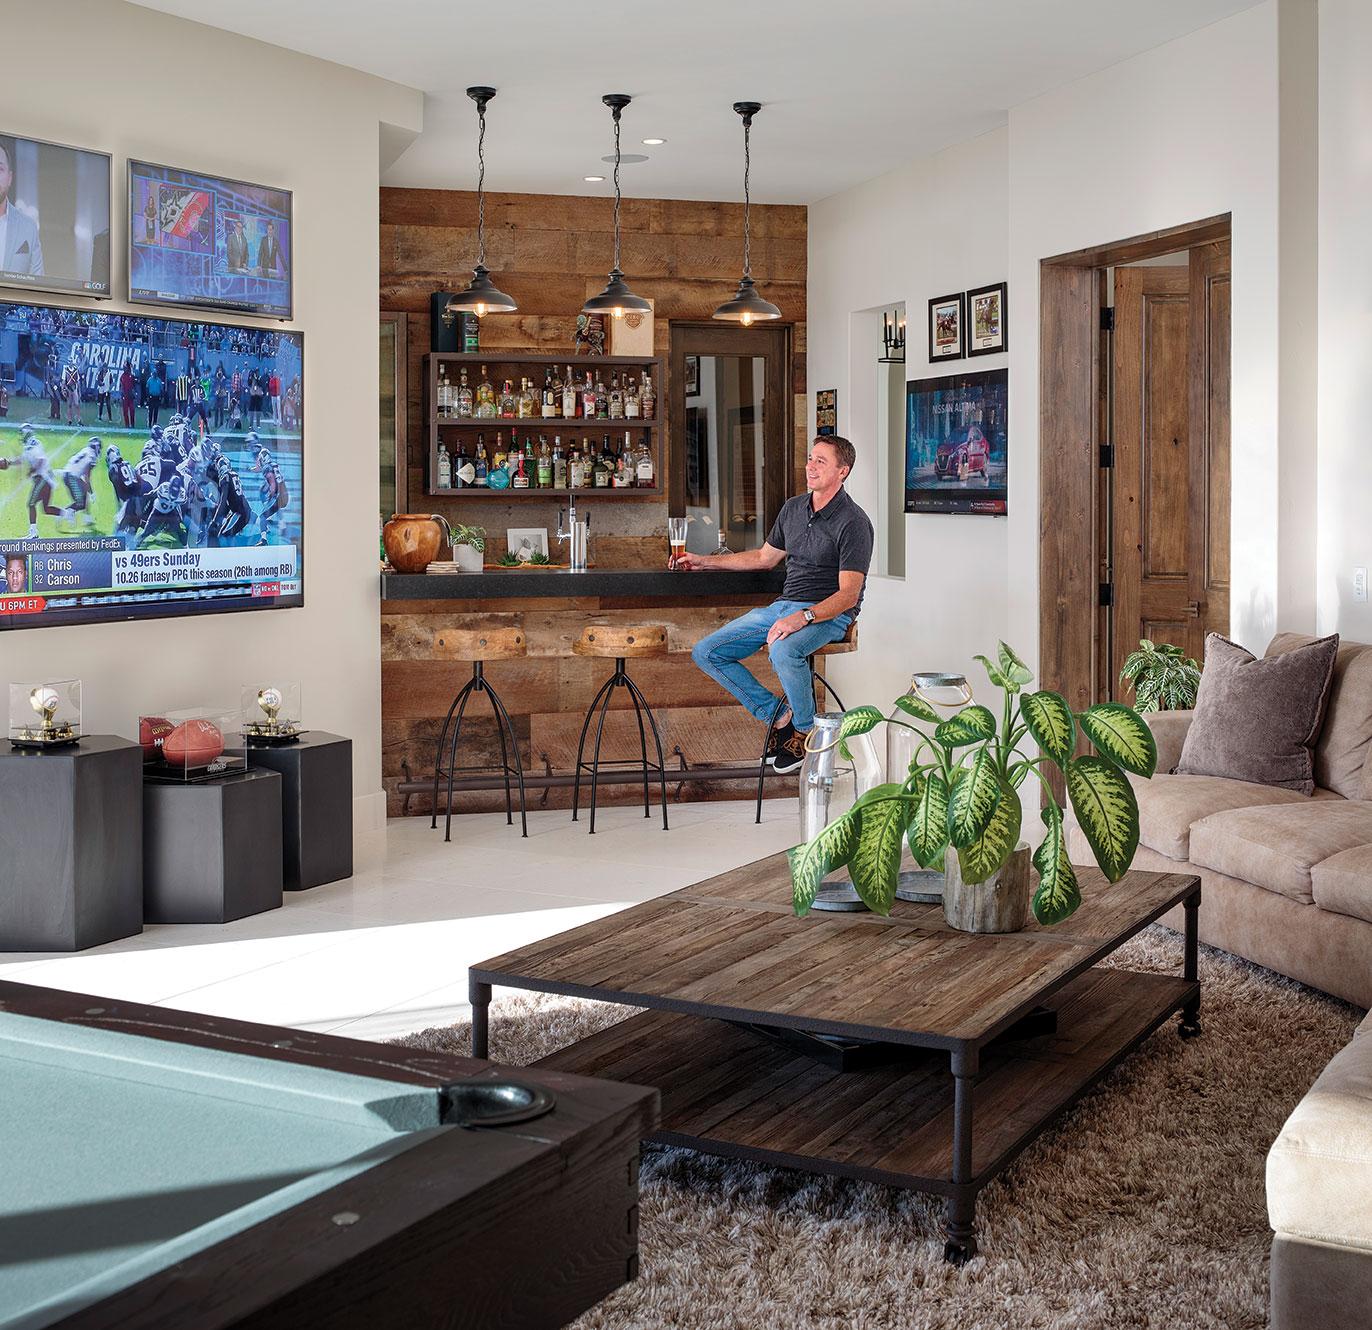 Italian home design San Diego TV room